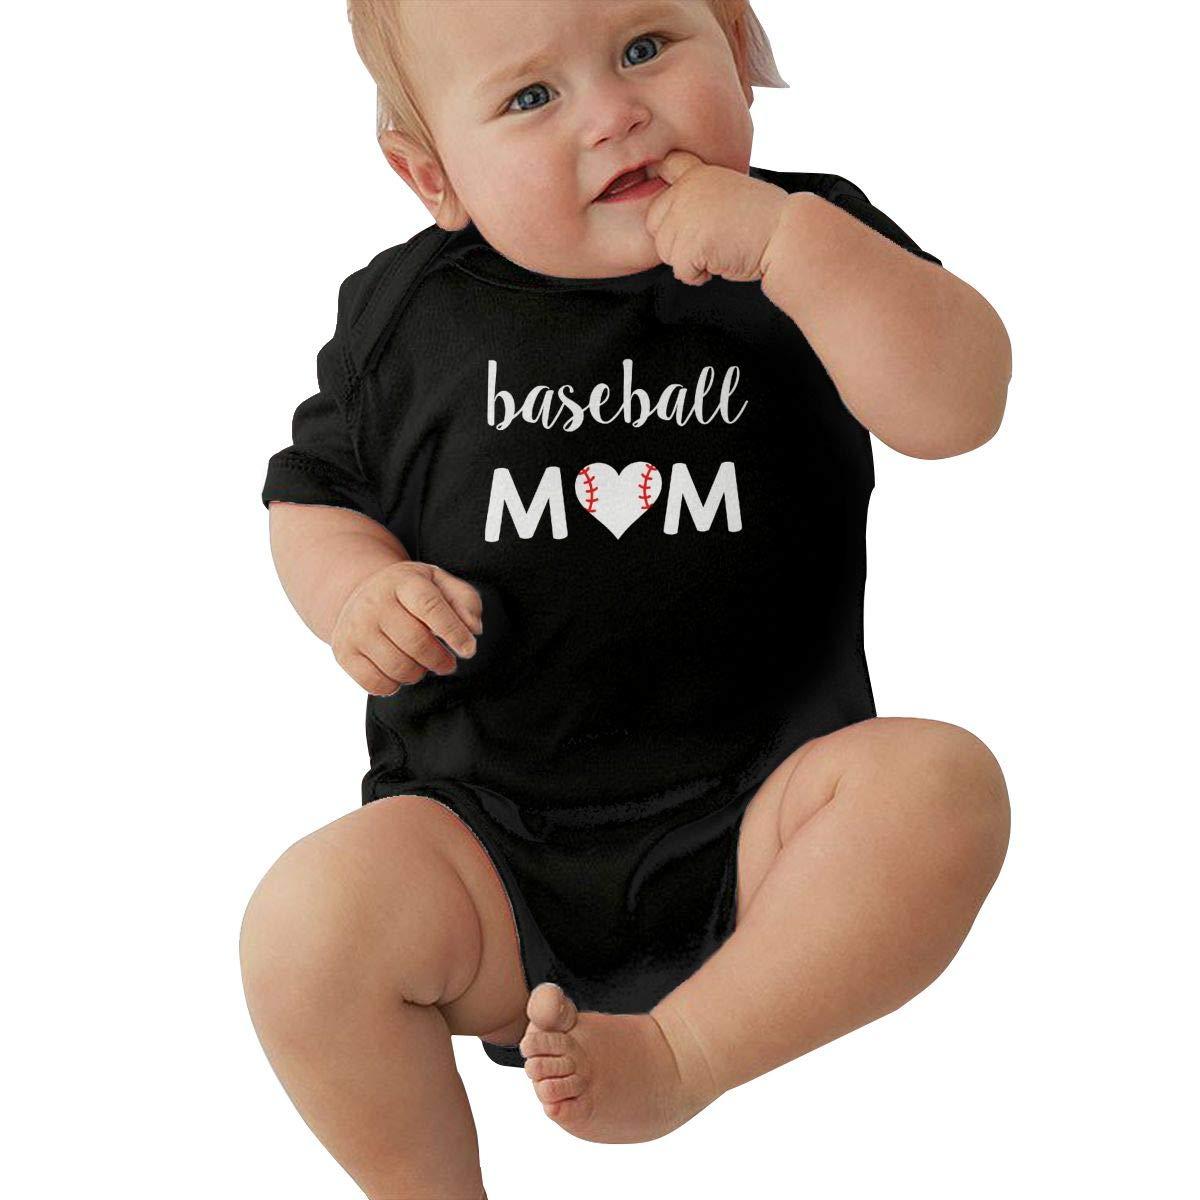 Dfenere Baseball Mom Fashion Newborn Baby Short Sleeve Bodysuit Romper Infant Summer Clothing Black